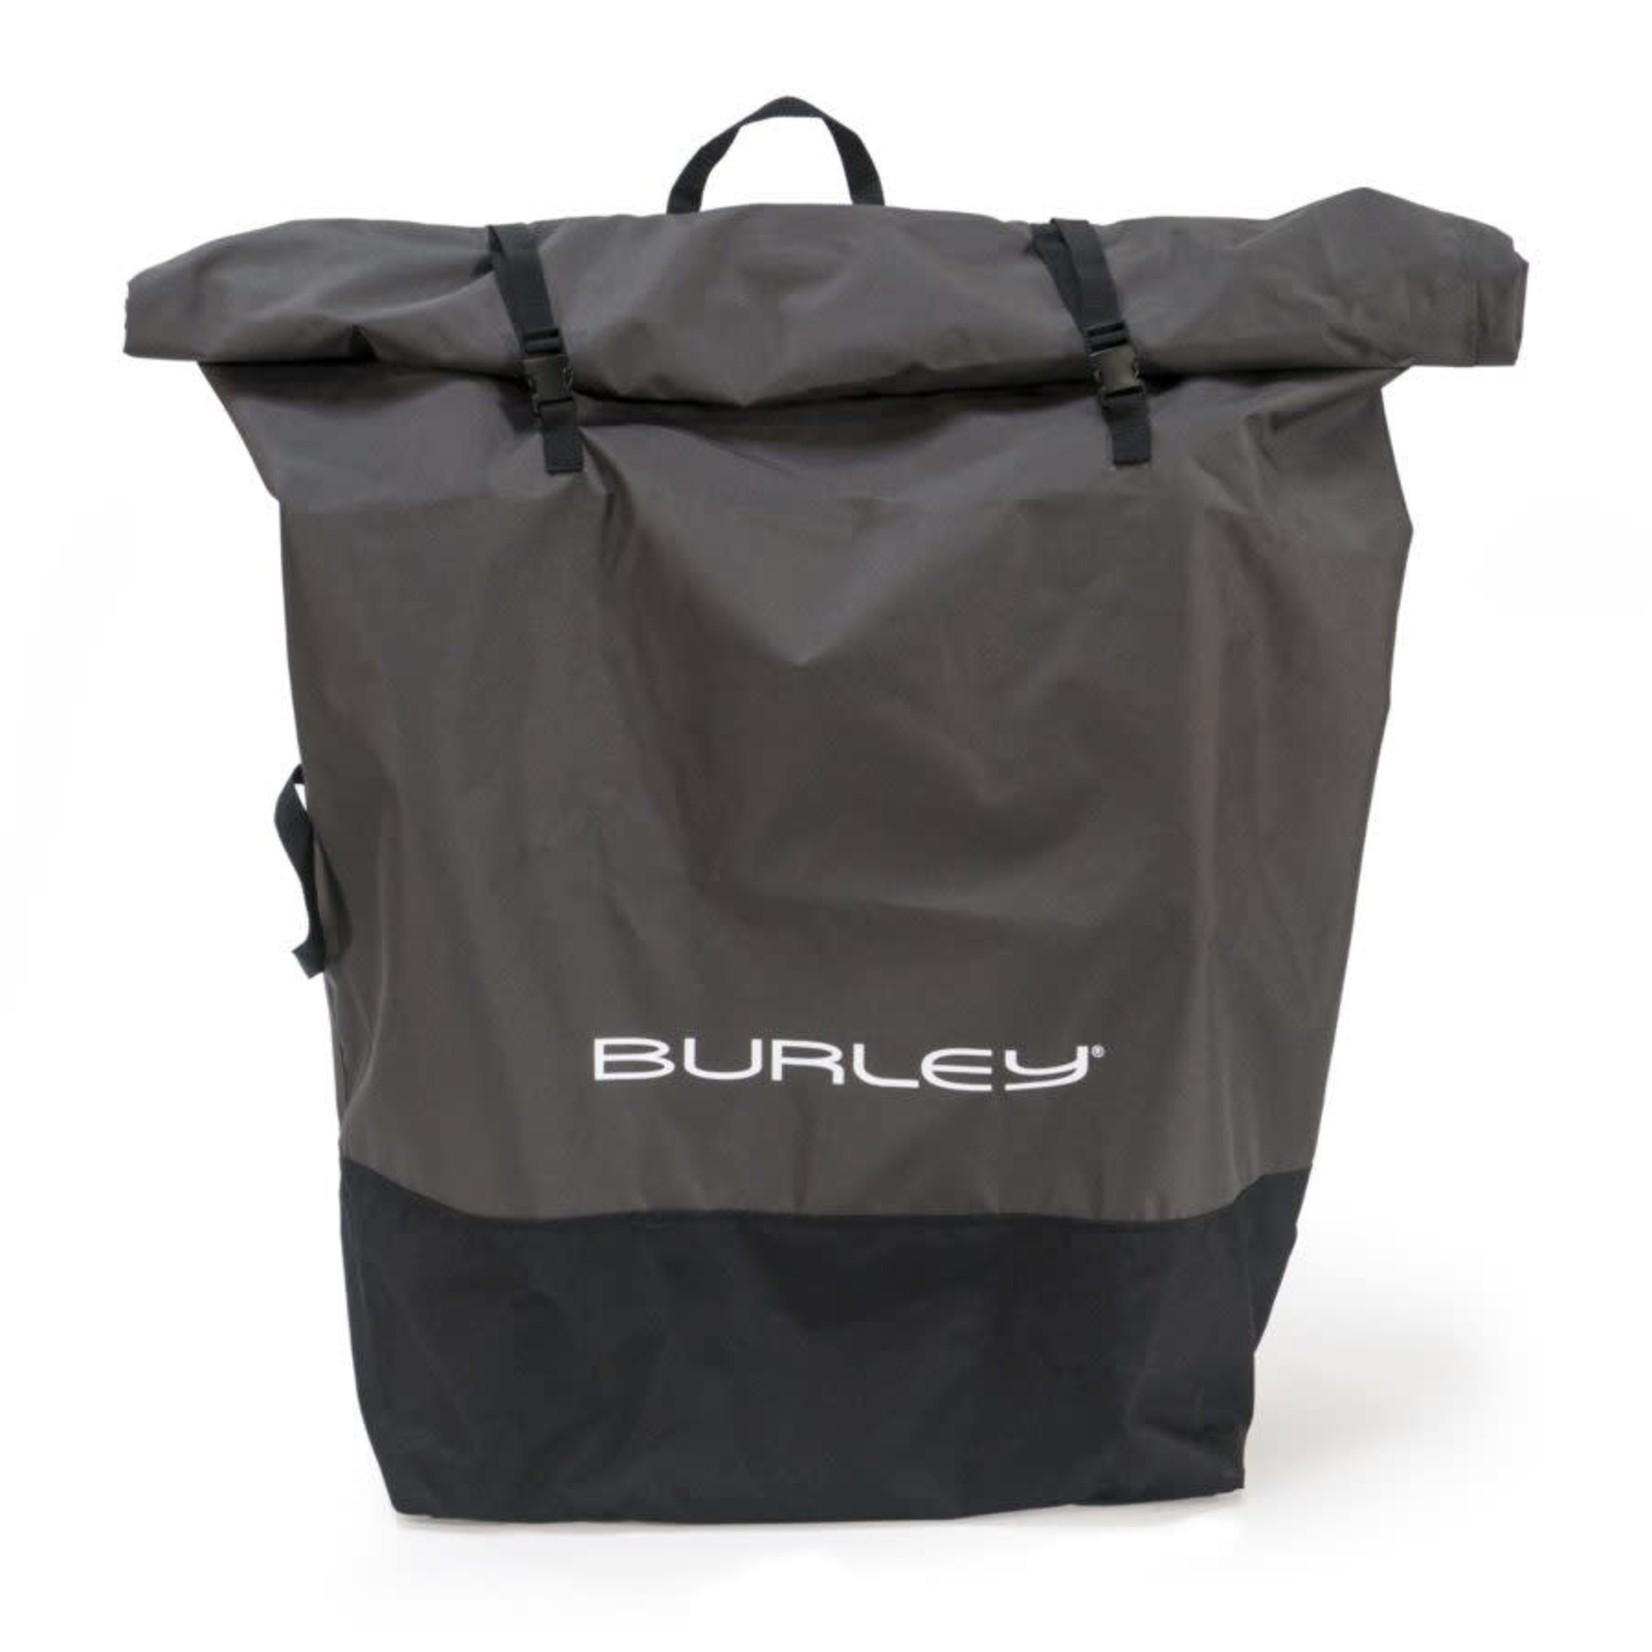 Burley Burley Trailer Storage Bag